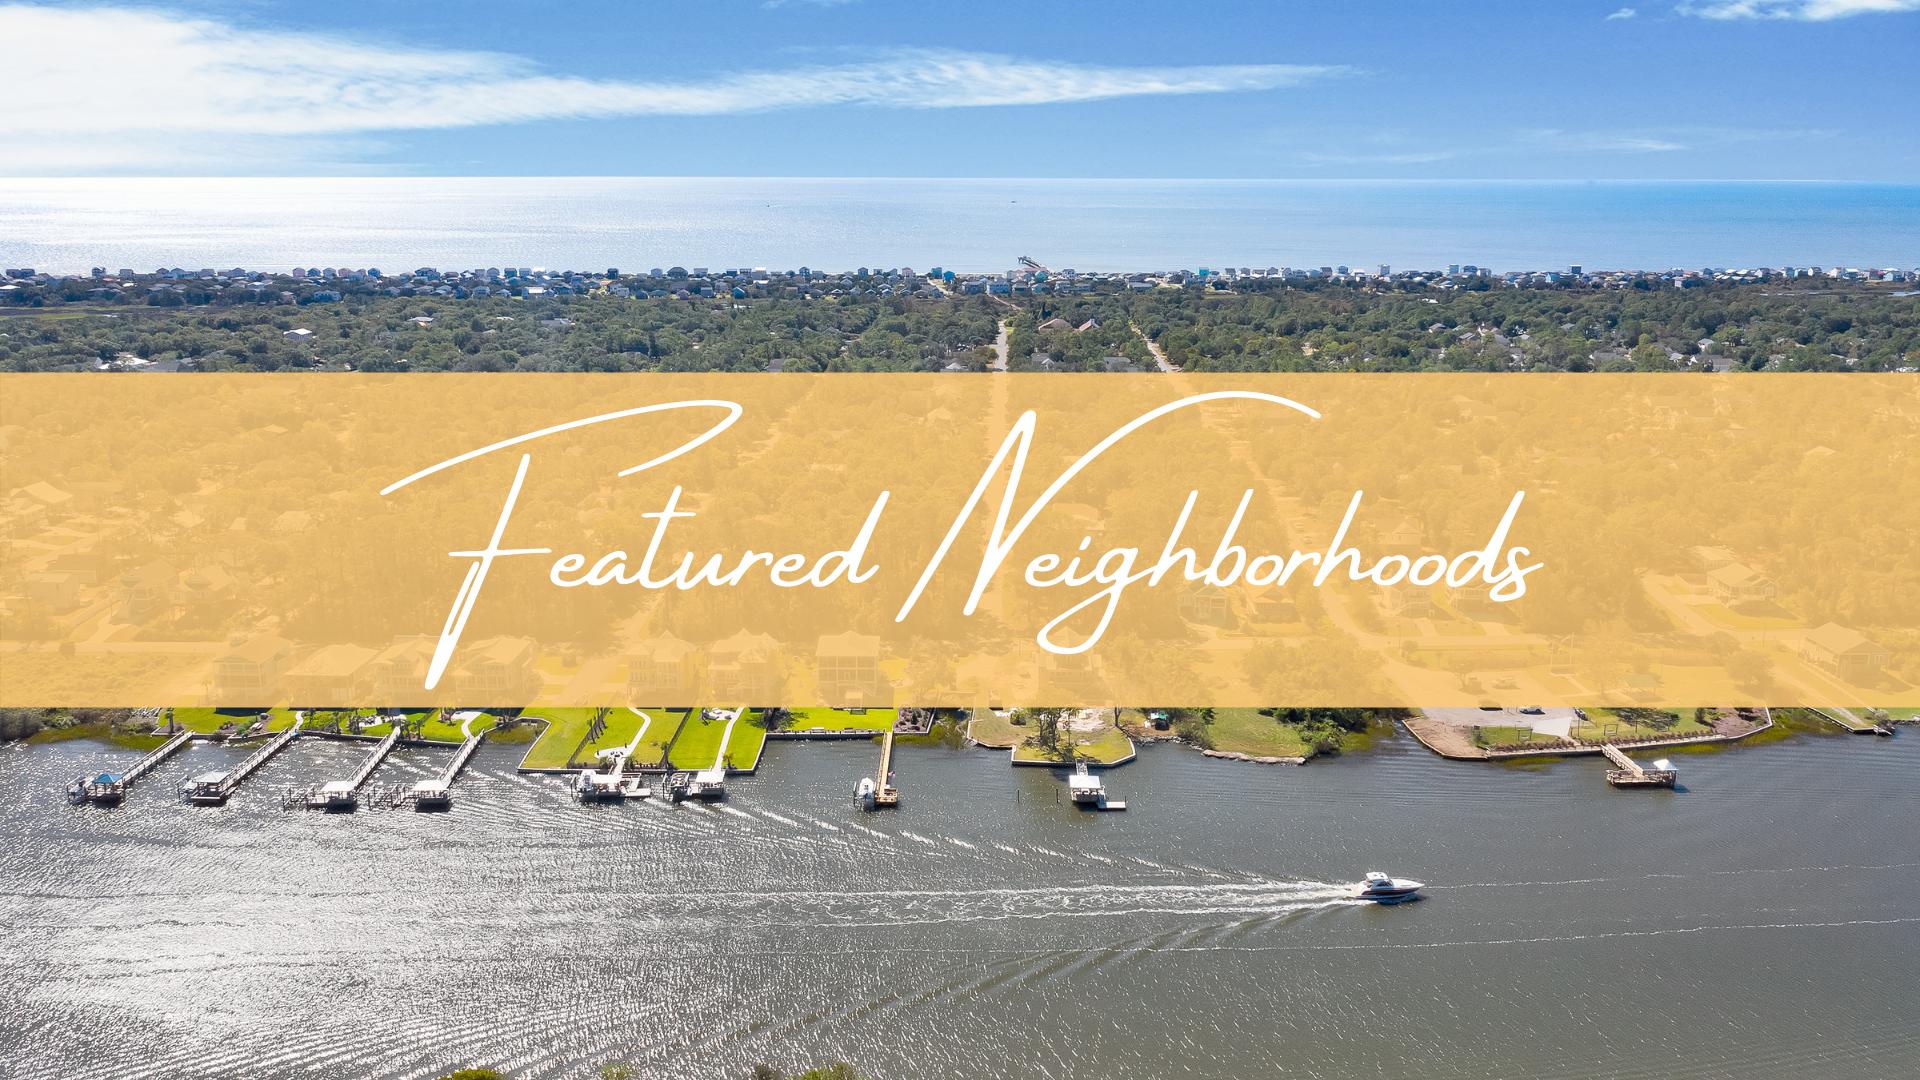 Explore Neighborhoods